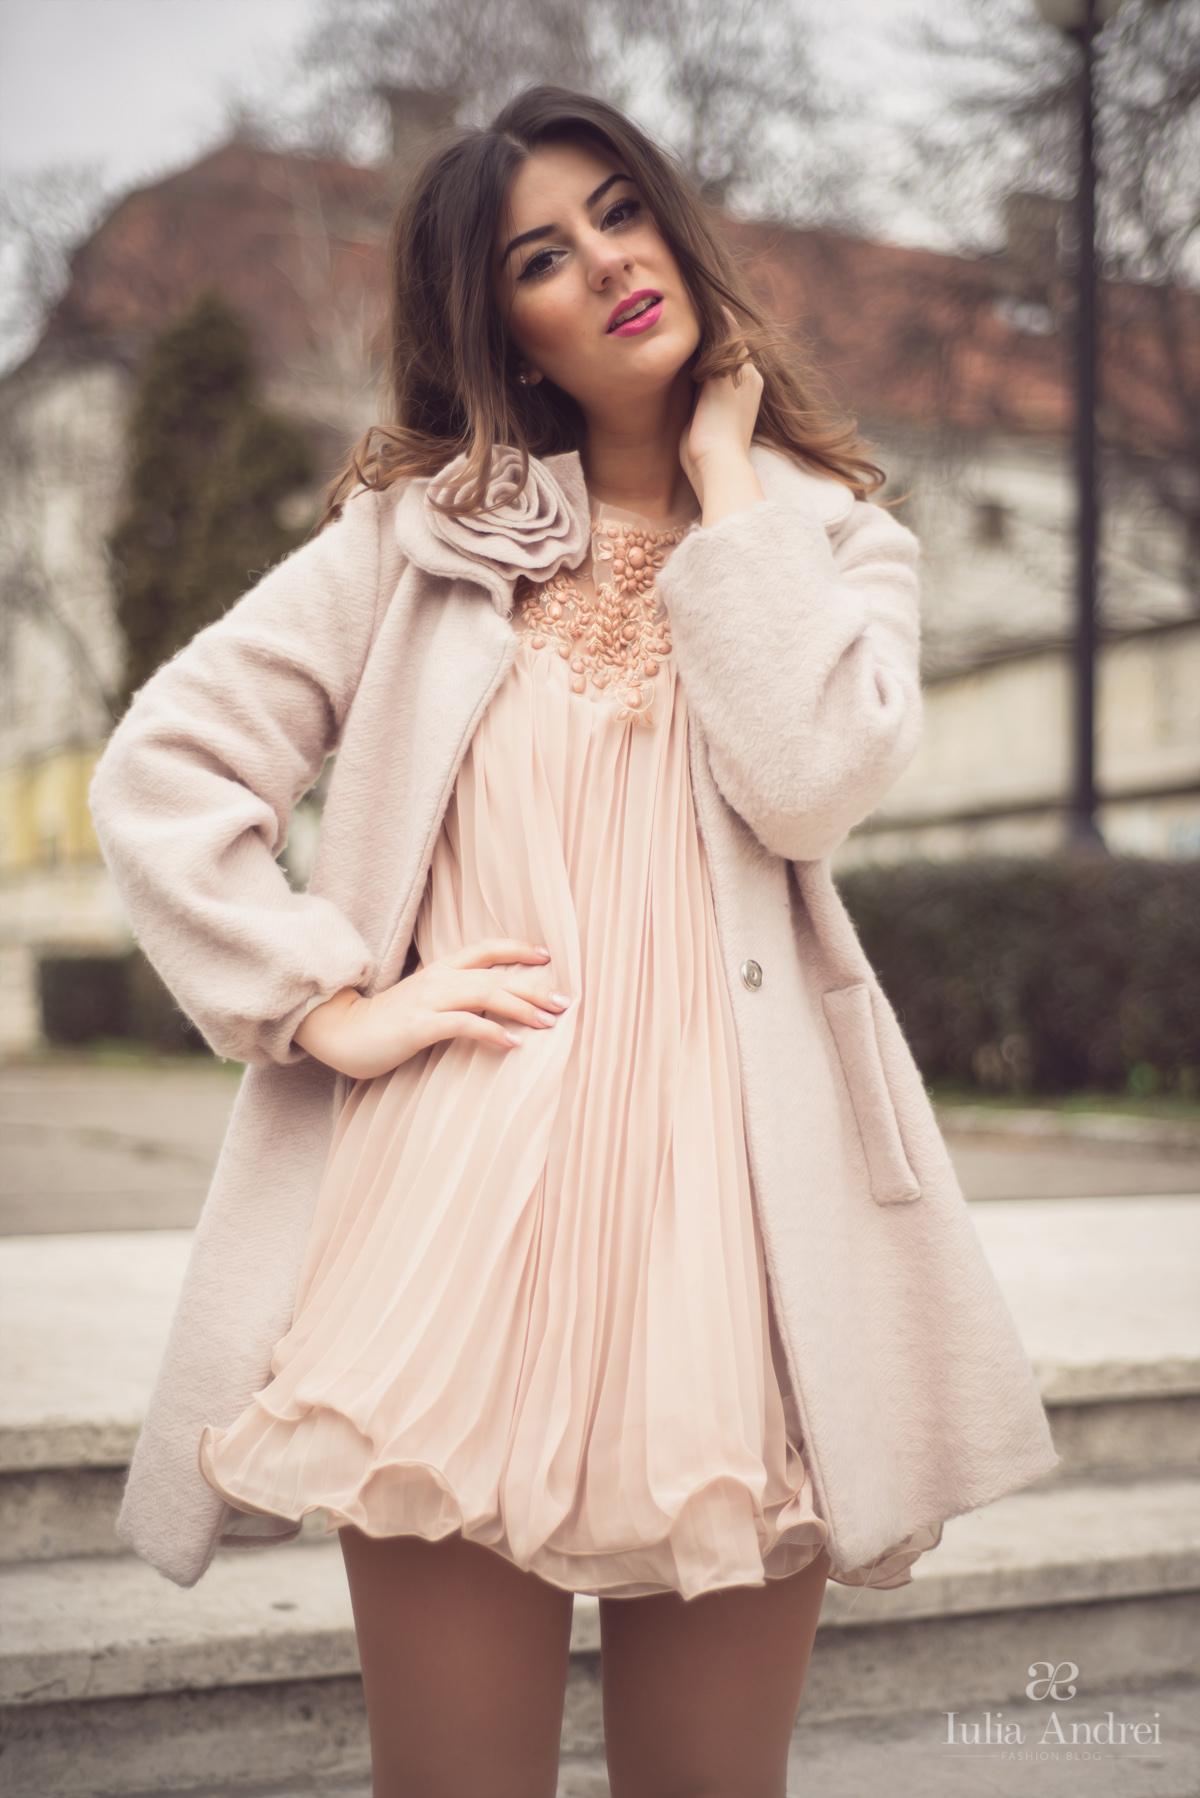 tinuta rochia nude culoarea pielii pentru ziua indragostitilor valentine's day 14 februarie dragobete iulia andrei fashion blog